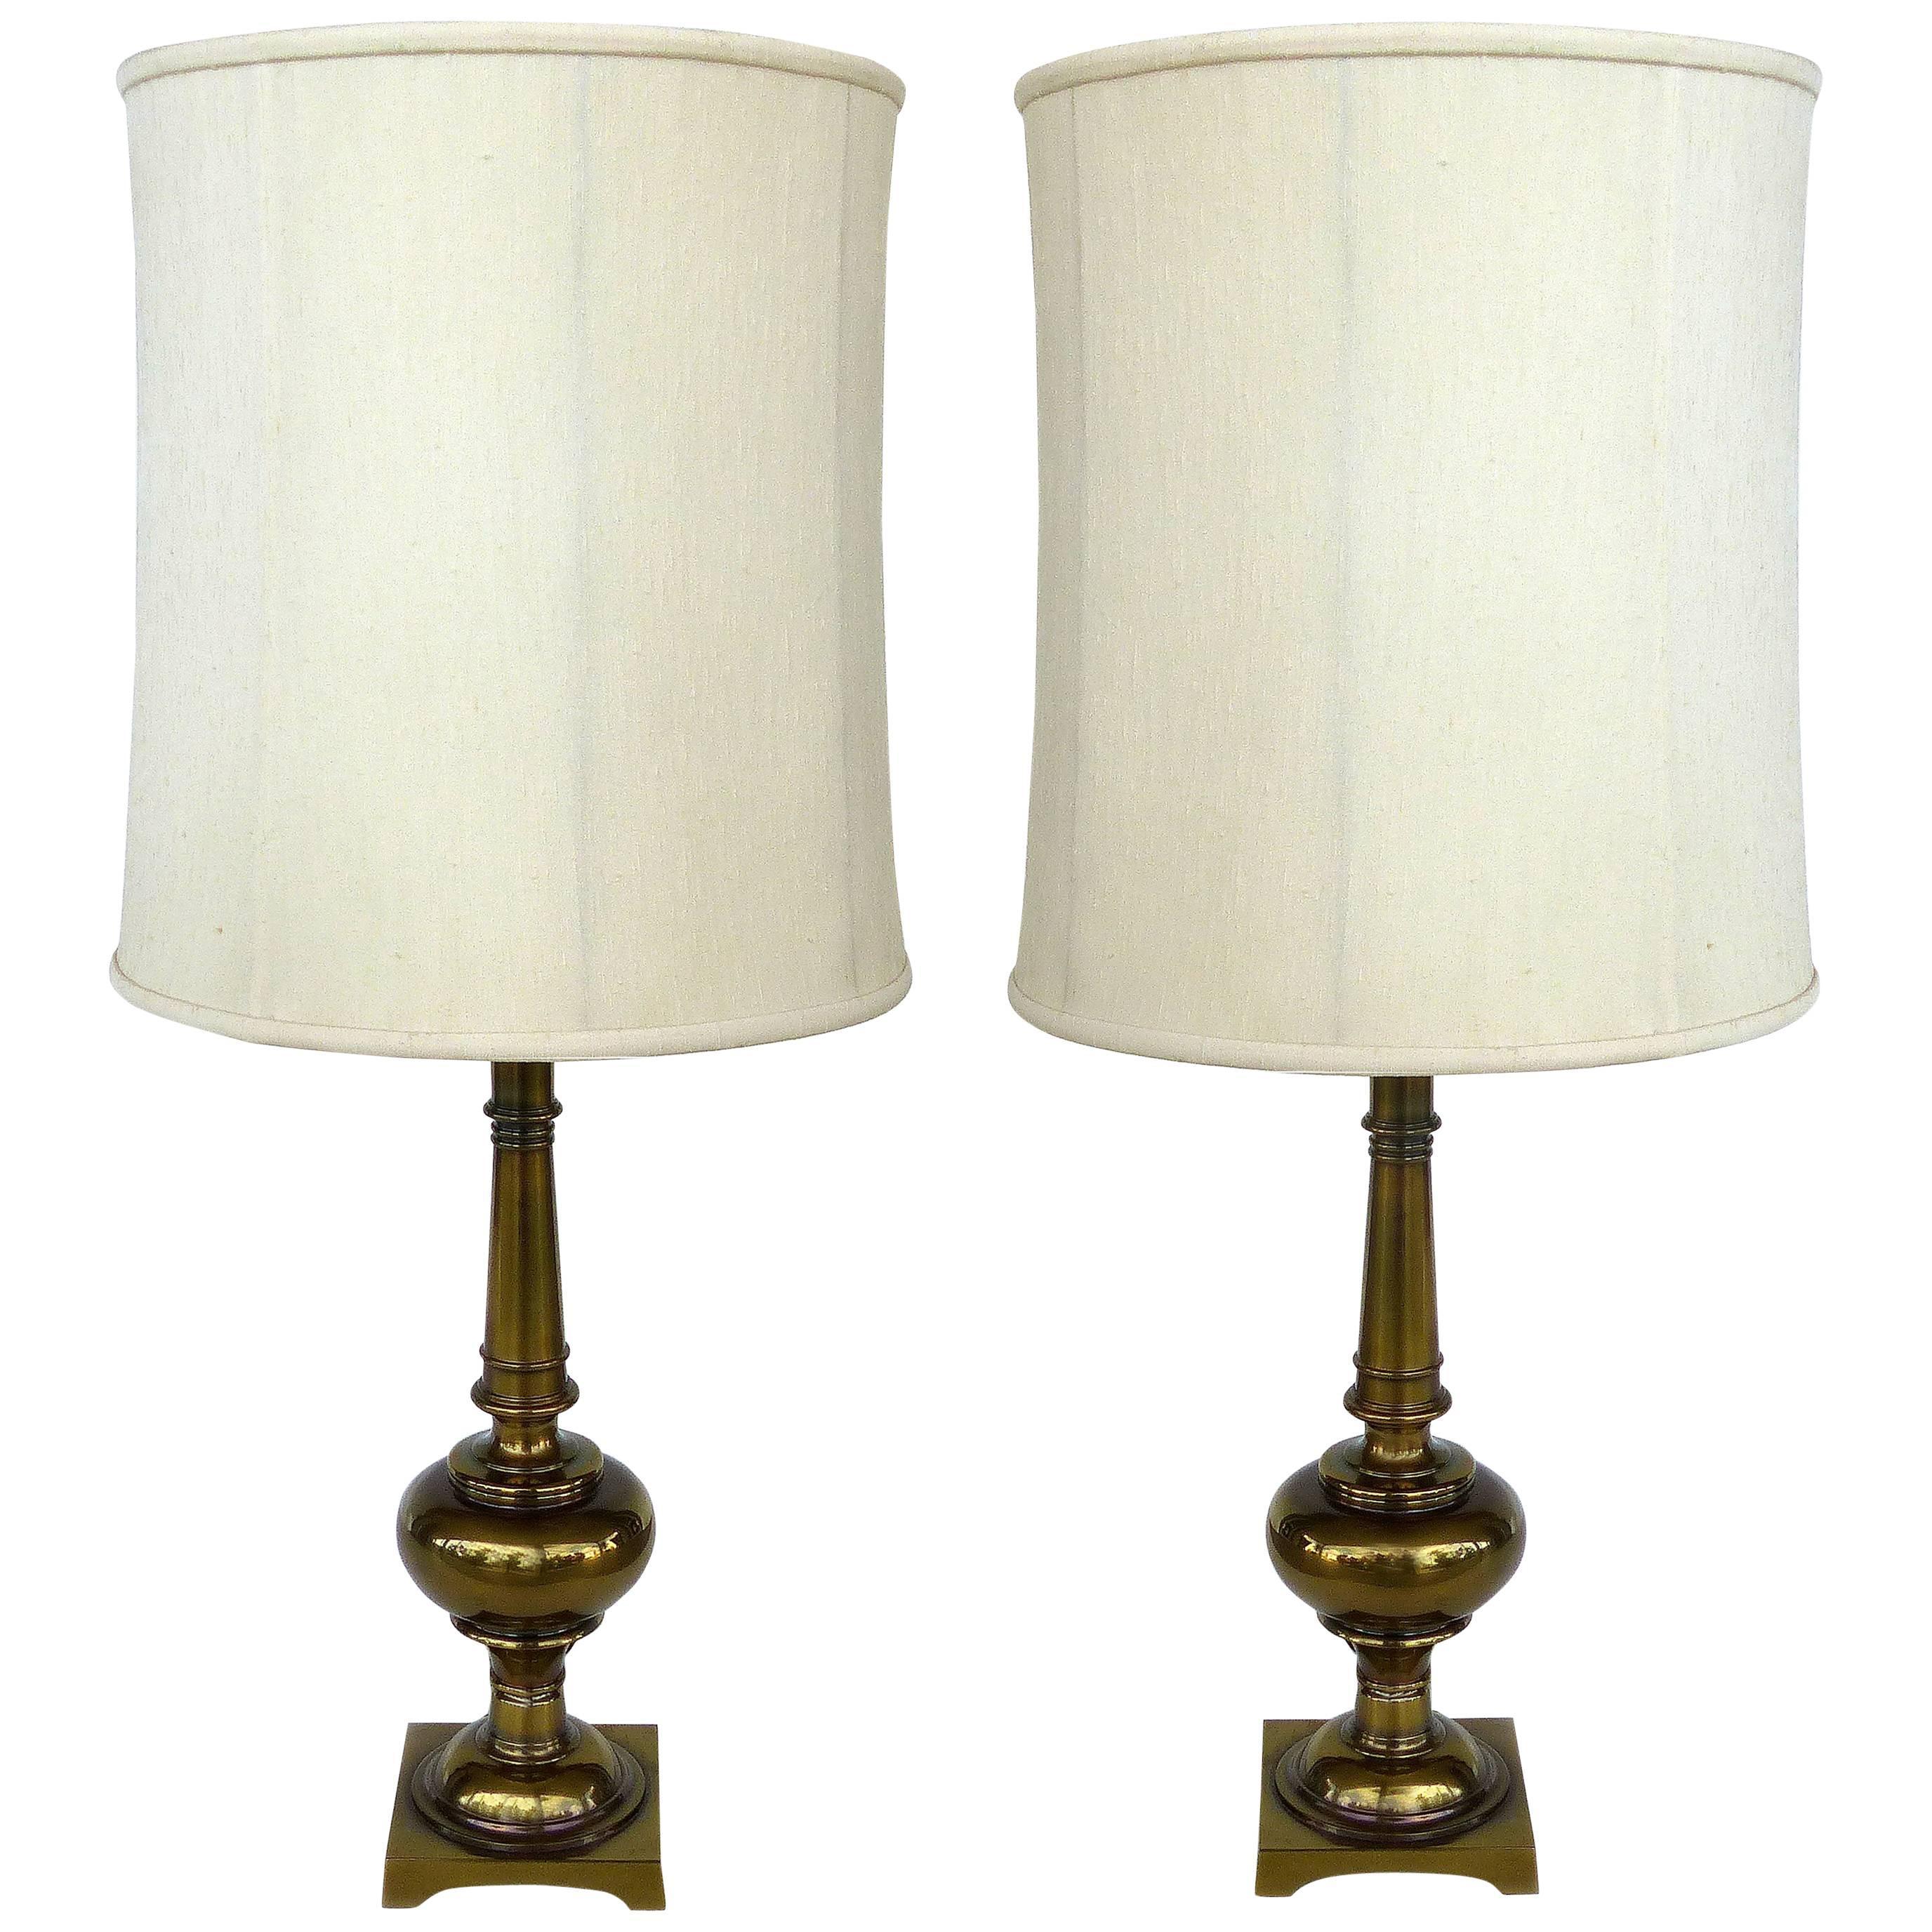 Pair of Stiffel Brass Table Lamps with Original Stiffel Shades